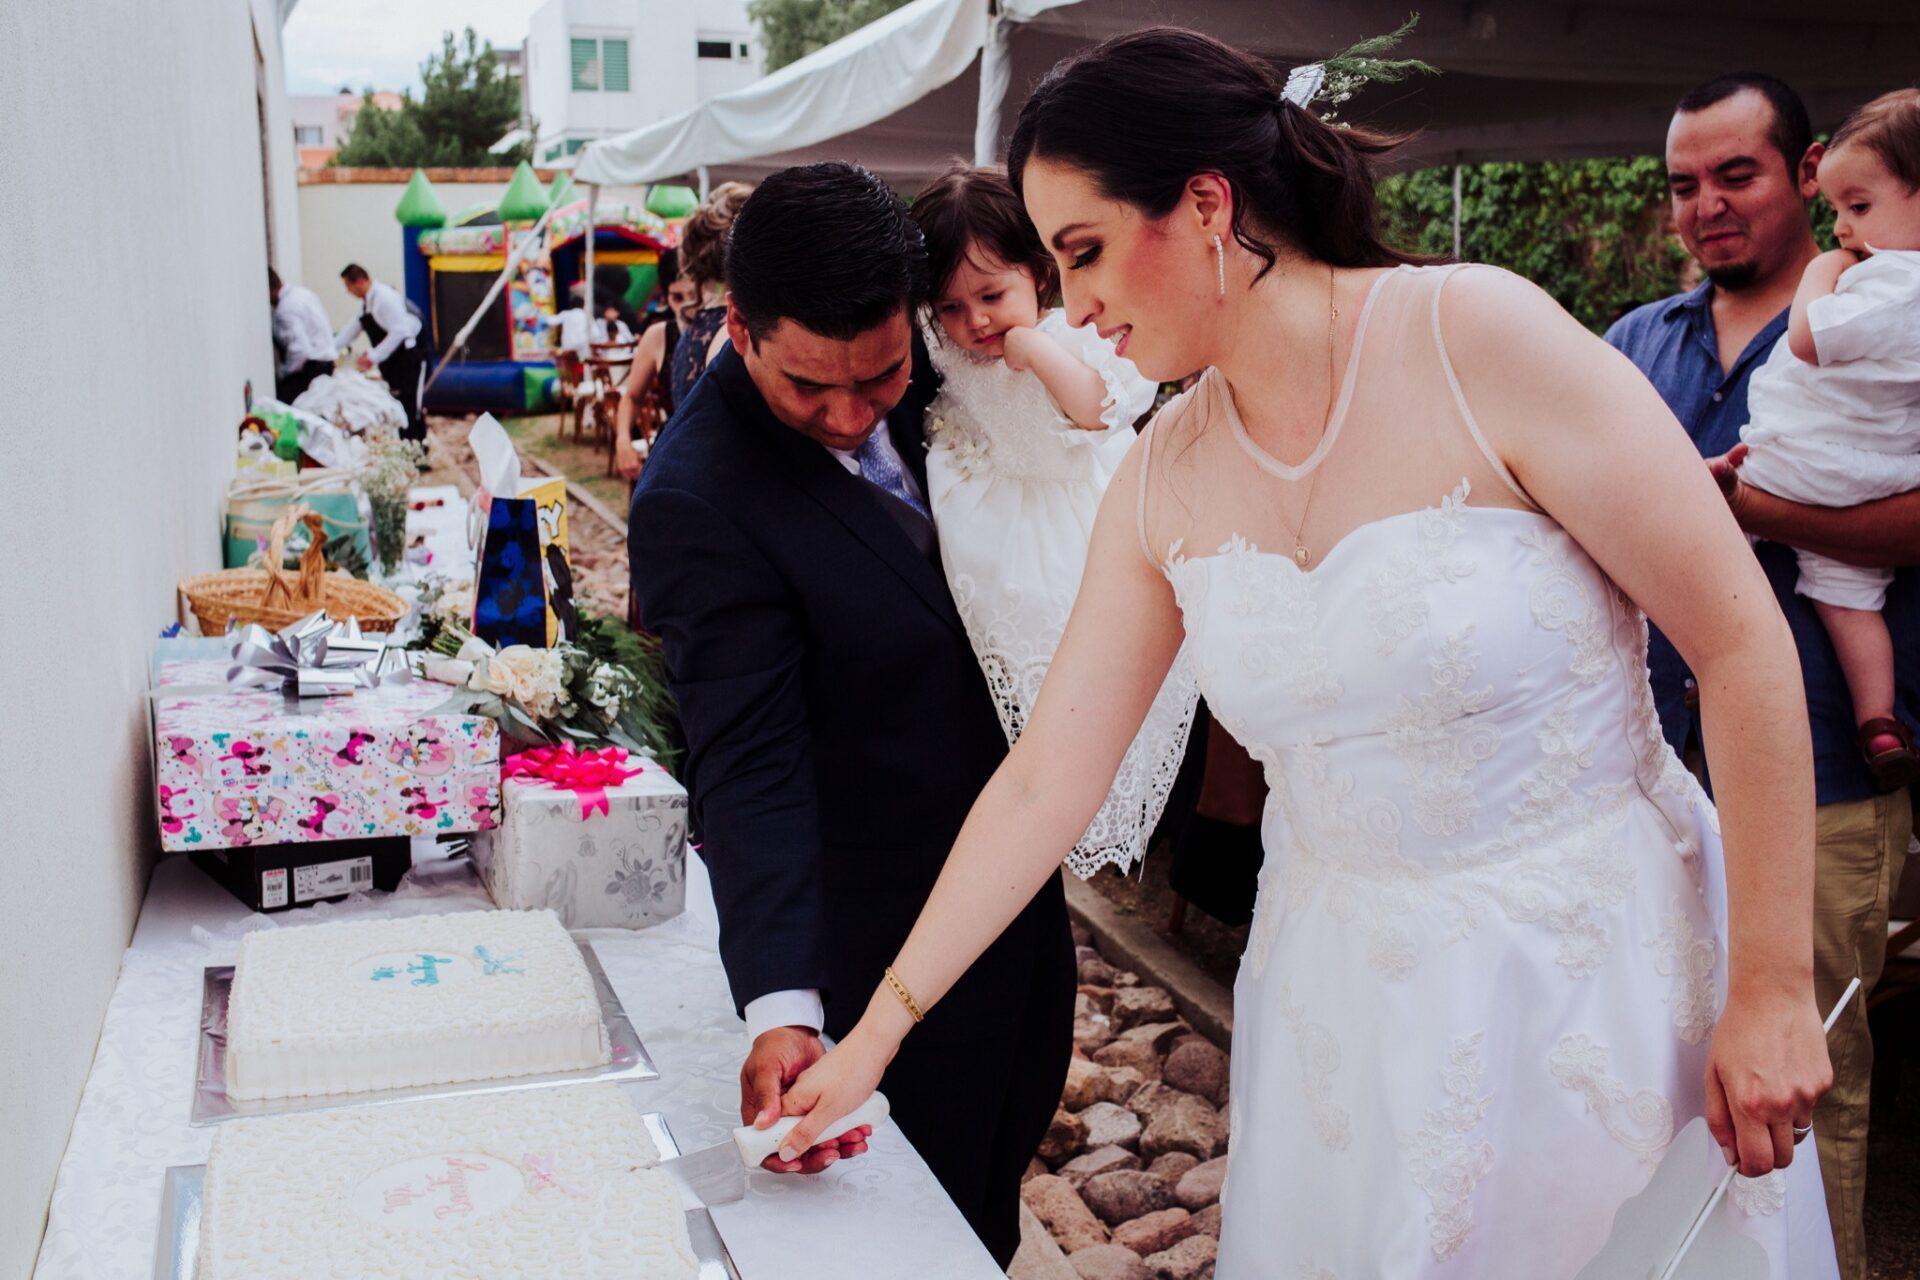 javier_noriega_fotografo_bodas_centro_platero_zacatecas_wedding_photographer37